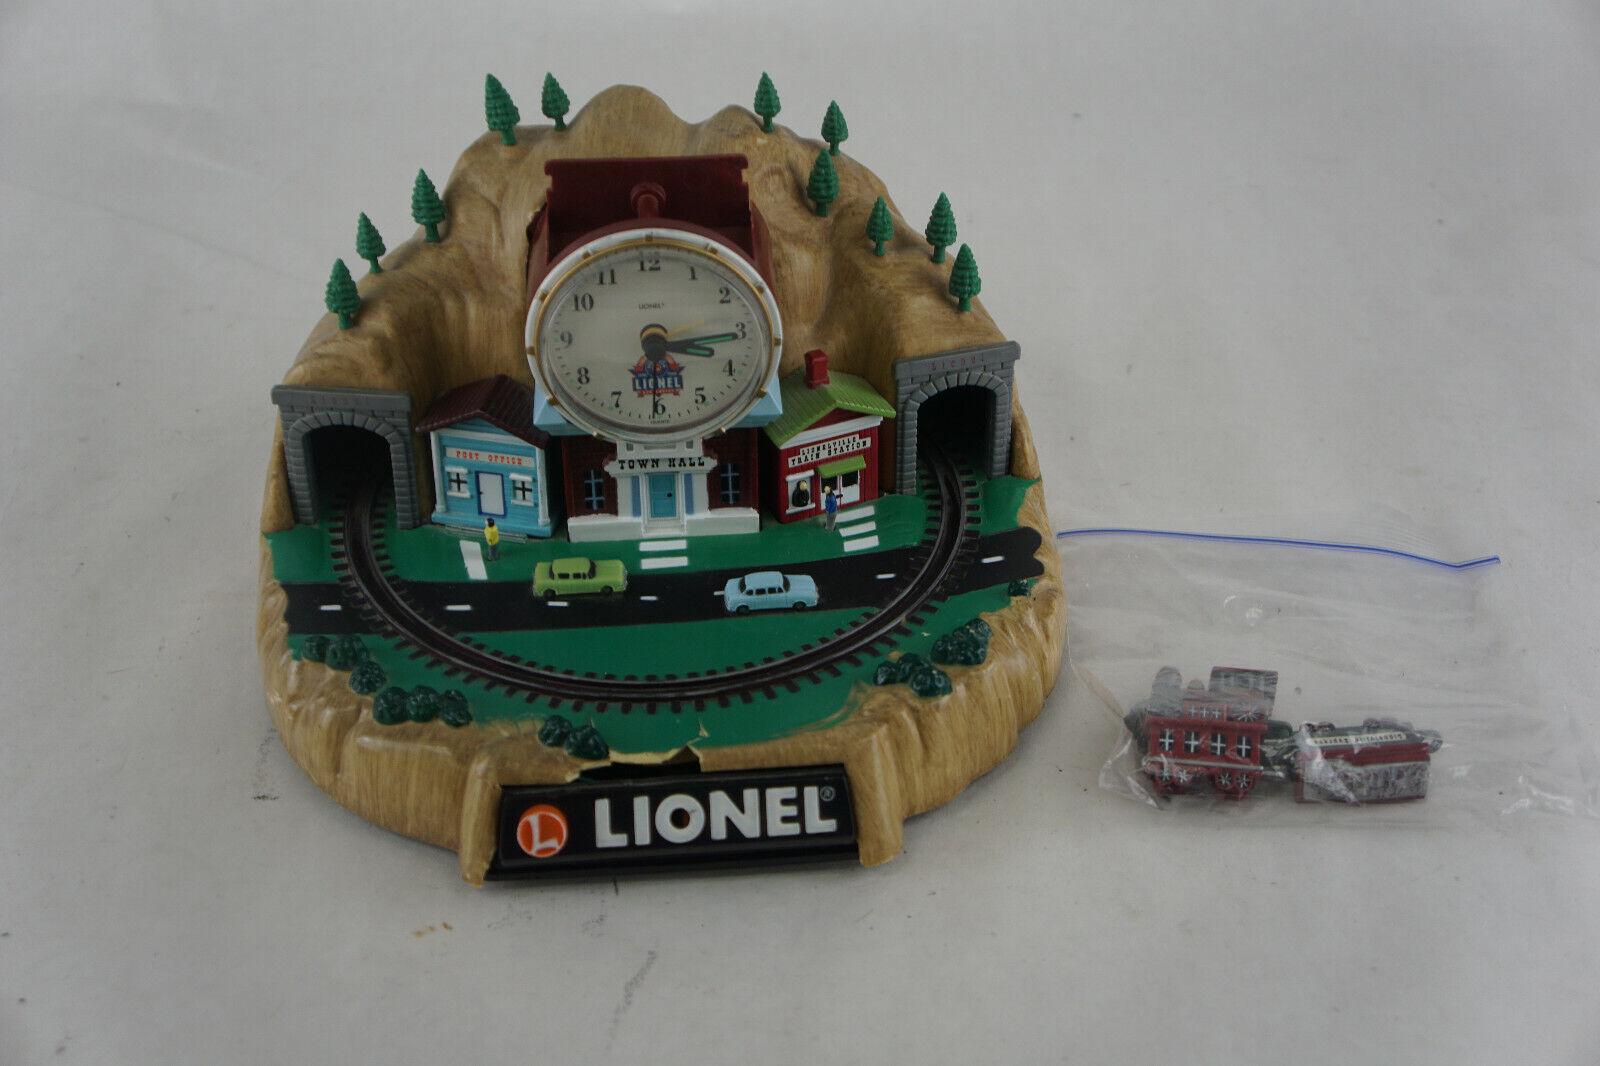 Lionel 100th Anniversary Animated Talking Train Alarm Clock - READ!